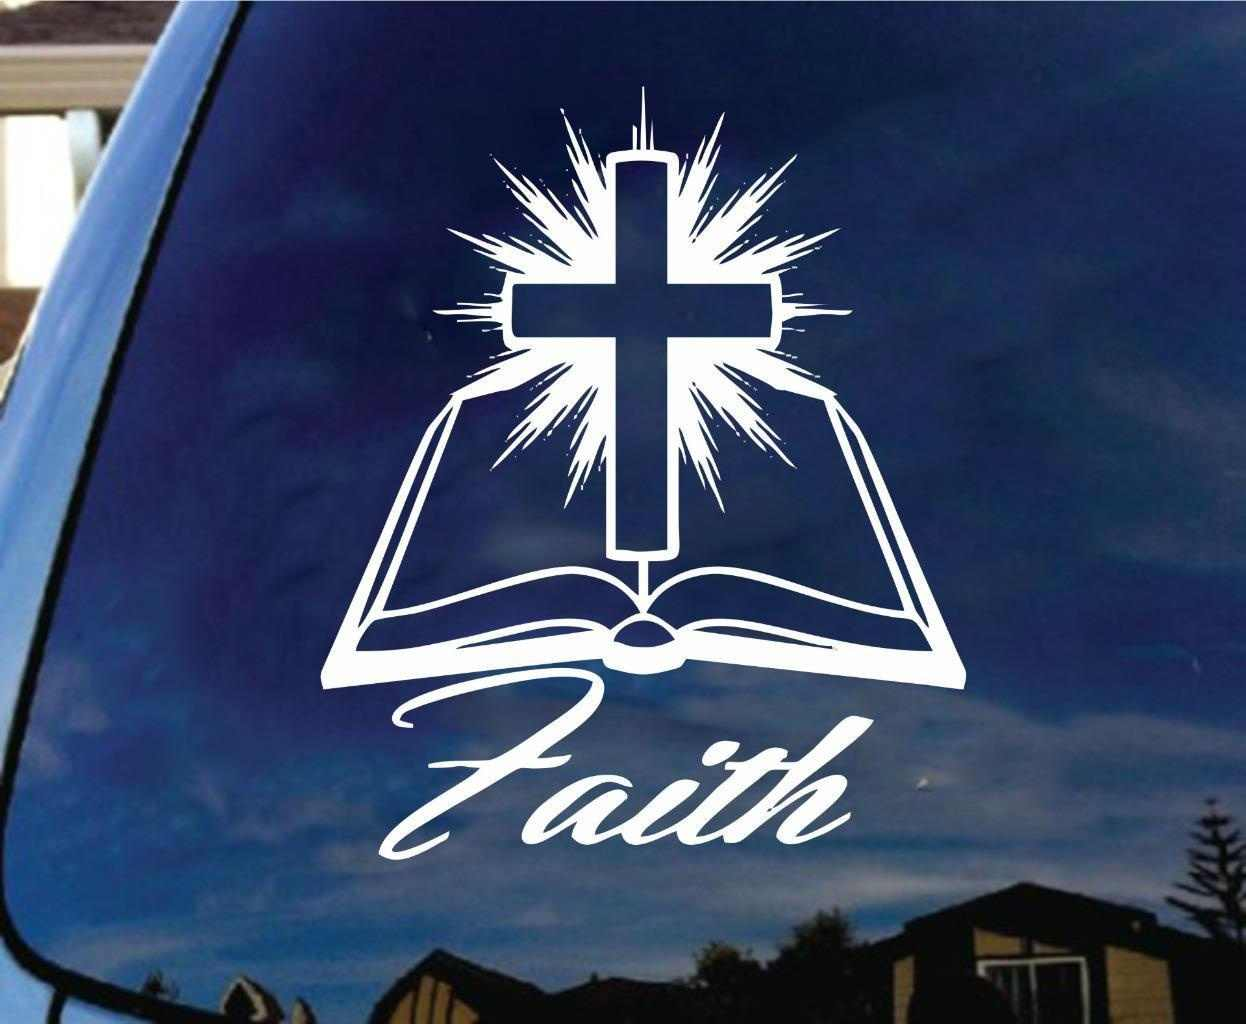 Faith Bible CrossไวนิลDecalสติกเกอร์คริสเตียนศาสนาJesus Christ Catholic 15 ซม.